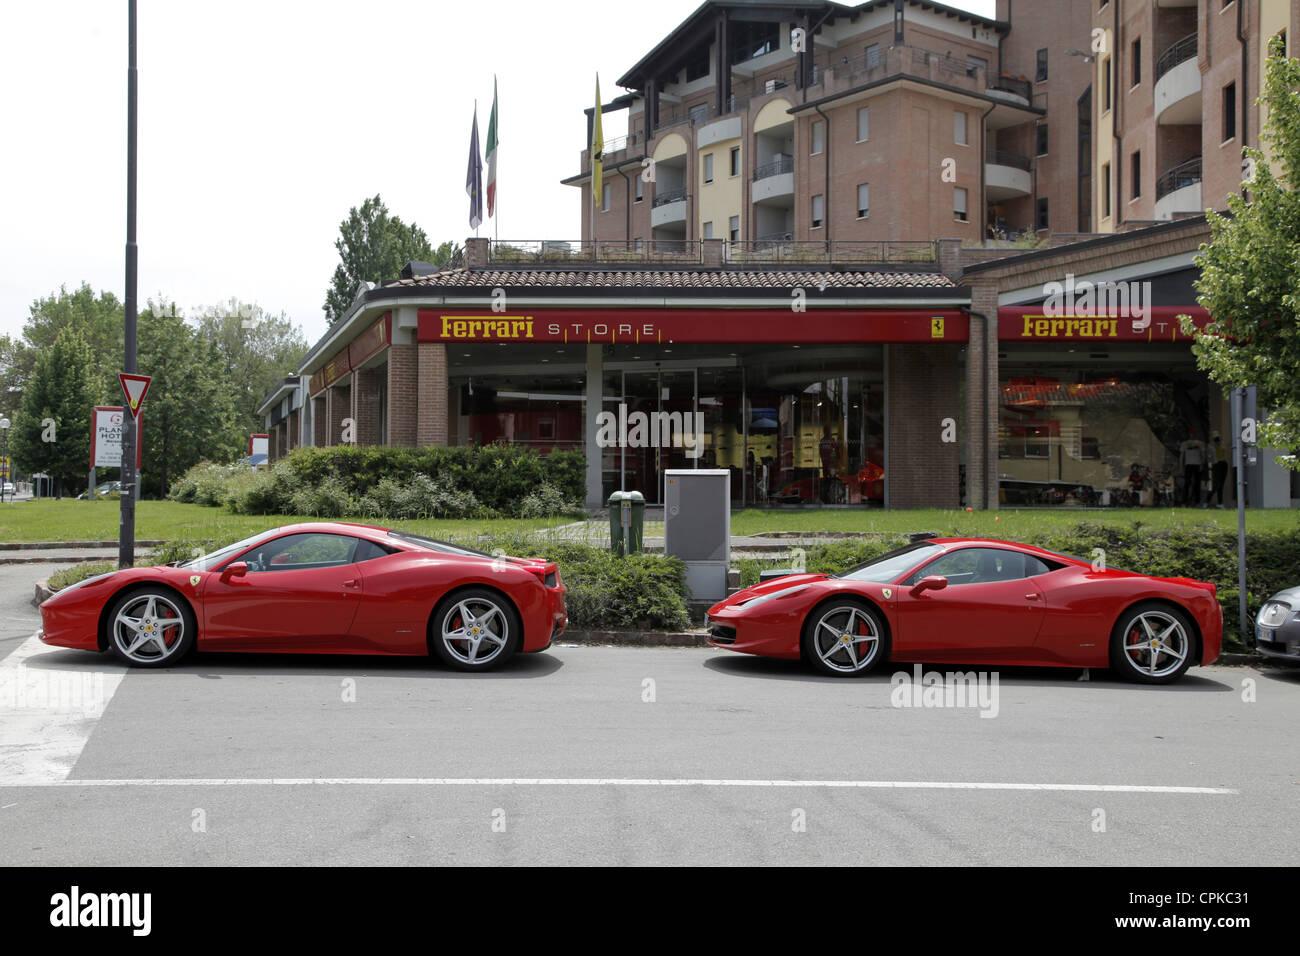 RED FERRARI 458 CARS & STORE MARANELLO ITALY 08 May 2012 - Stock Image